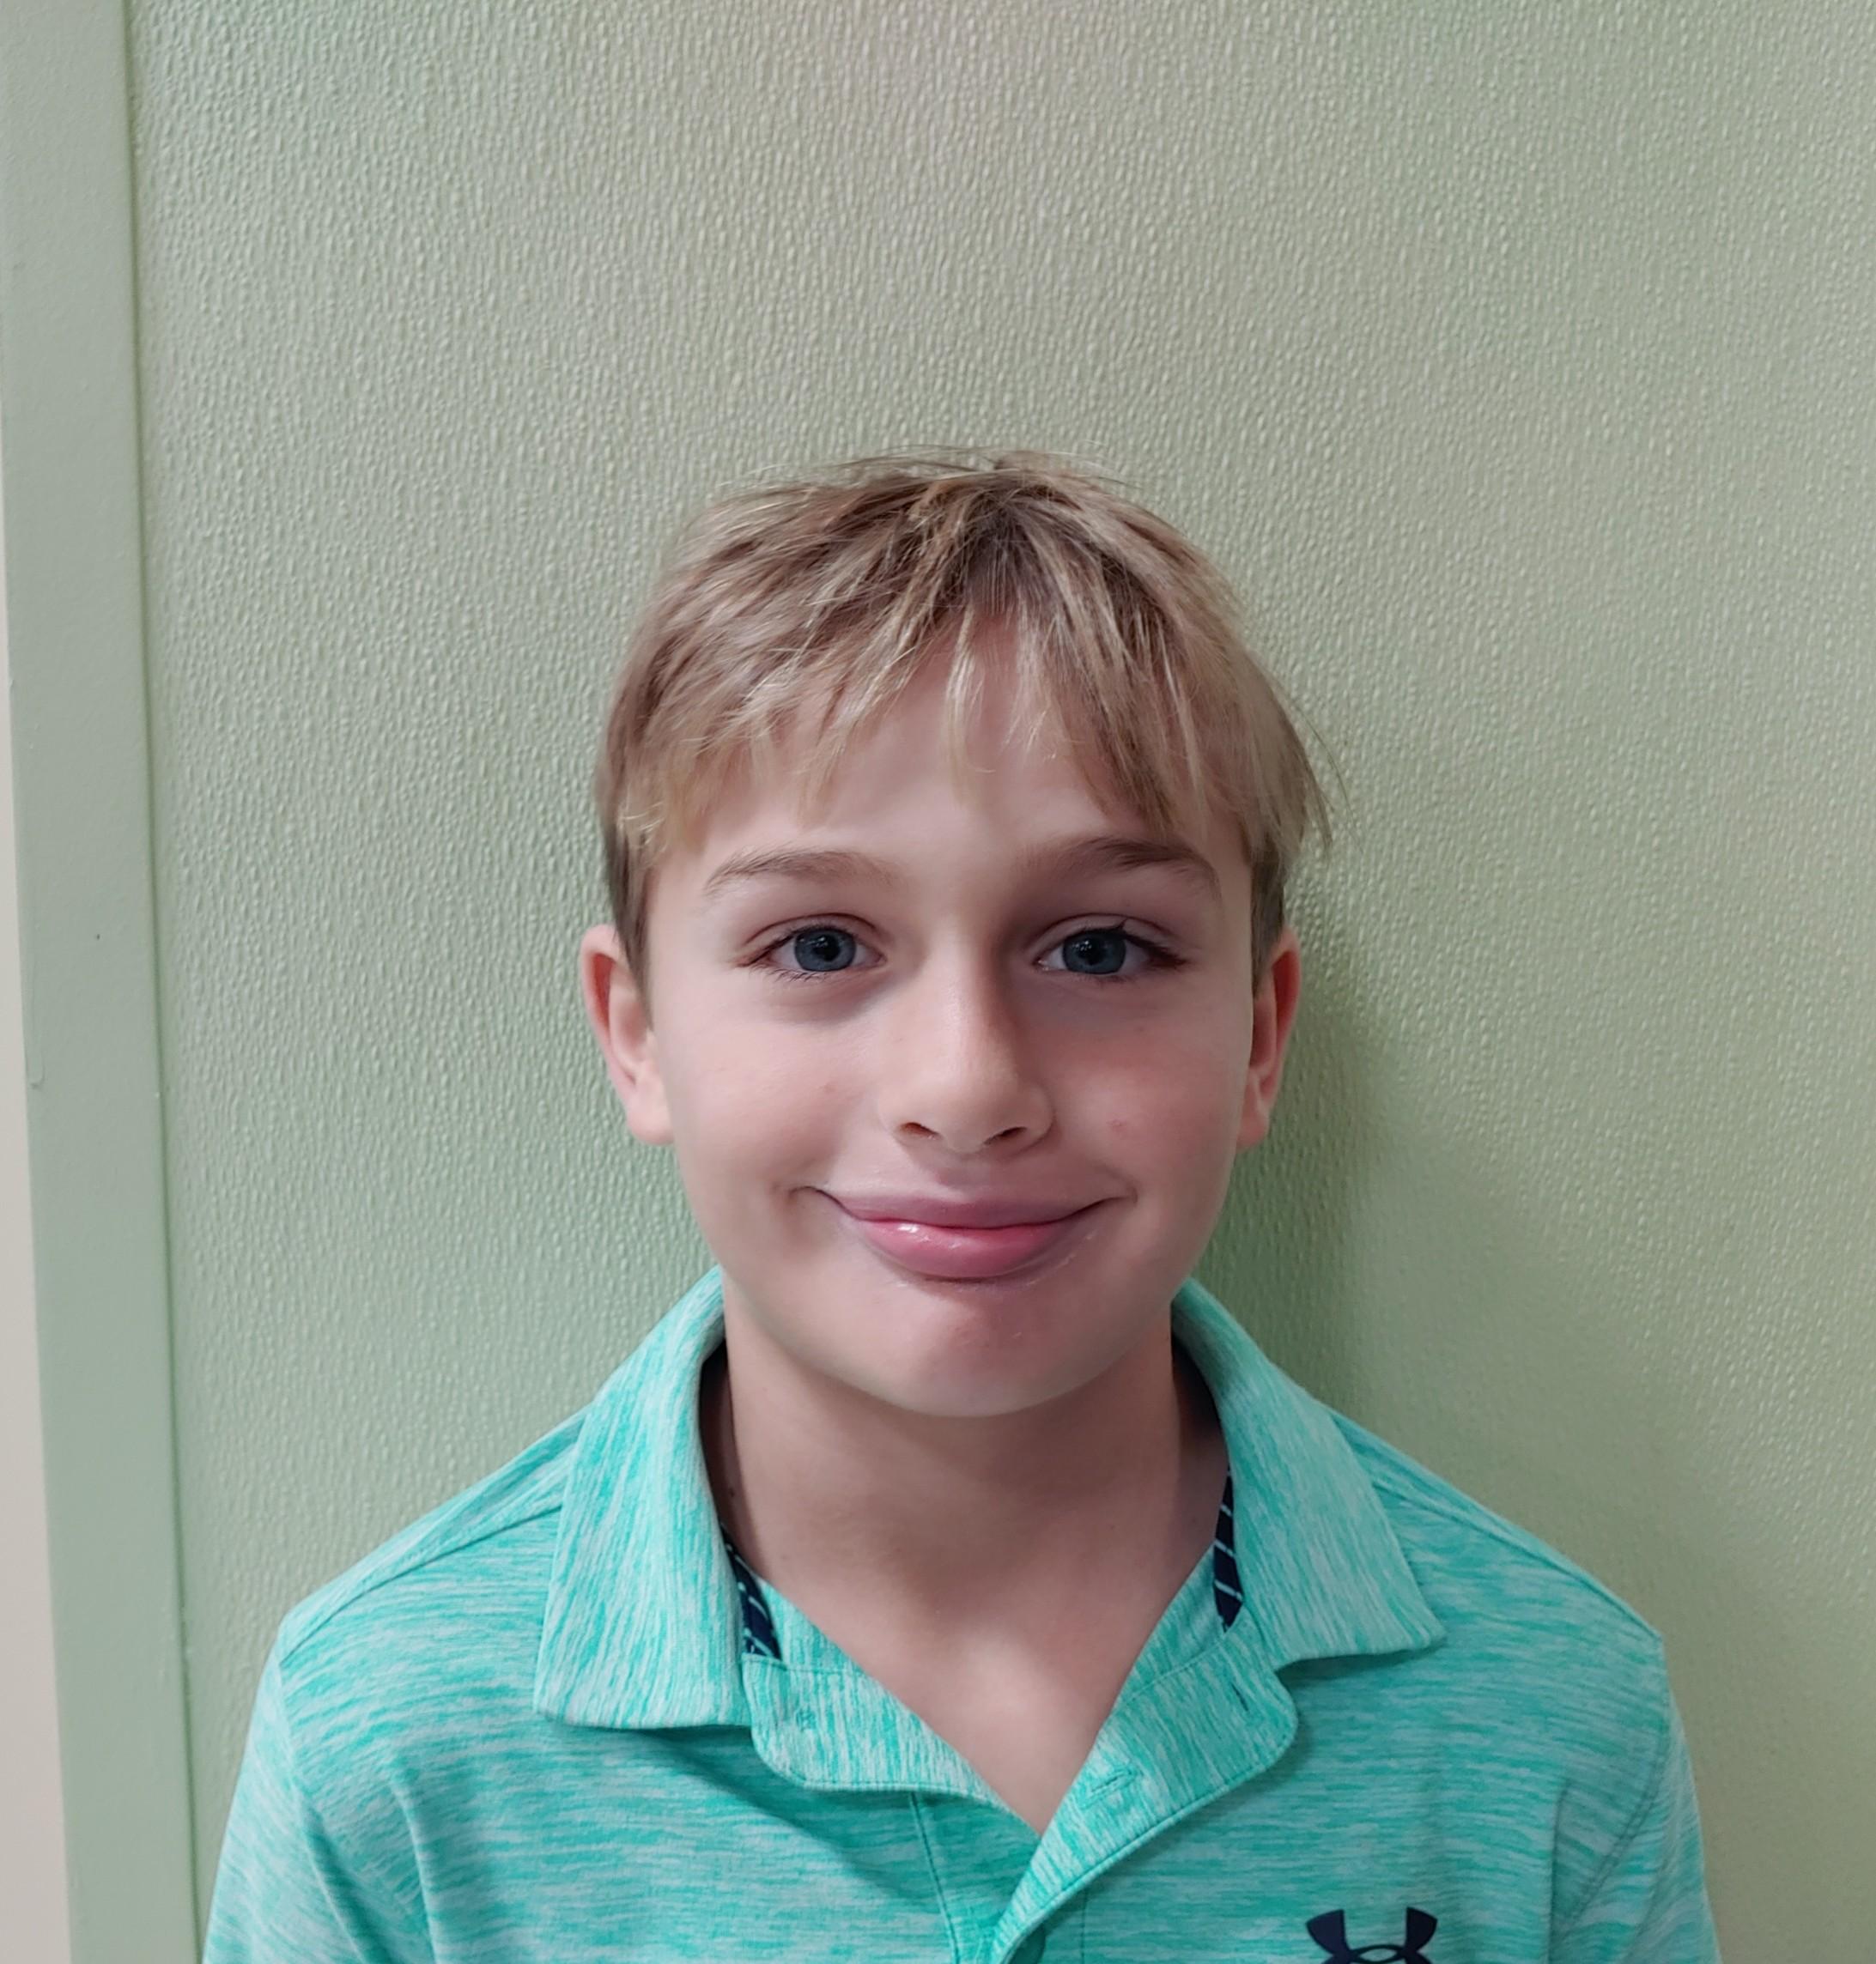 Ramen because it reminds me of spaghetti, but it is better.  Michael, age 9  Daniel Island